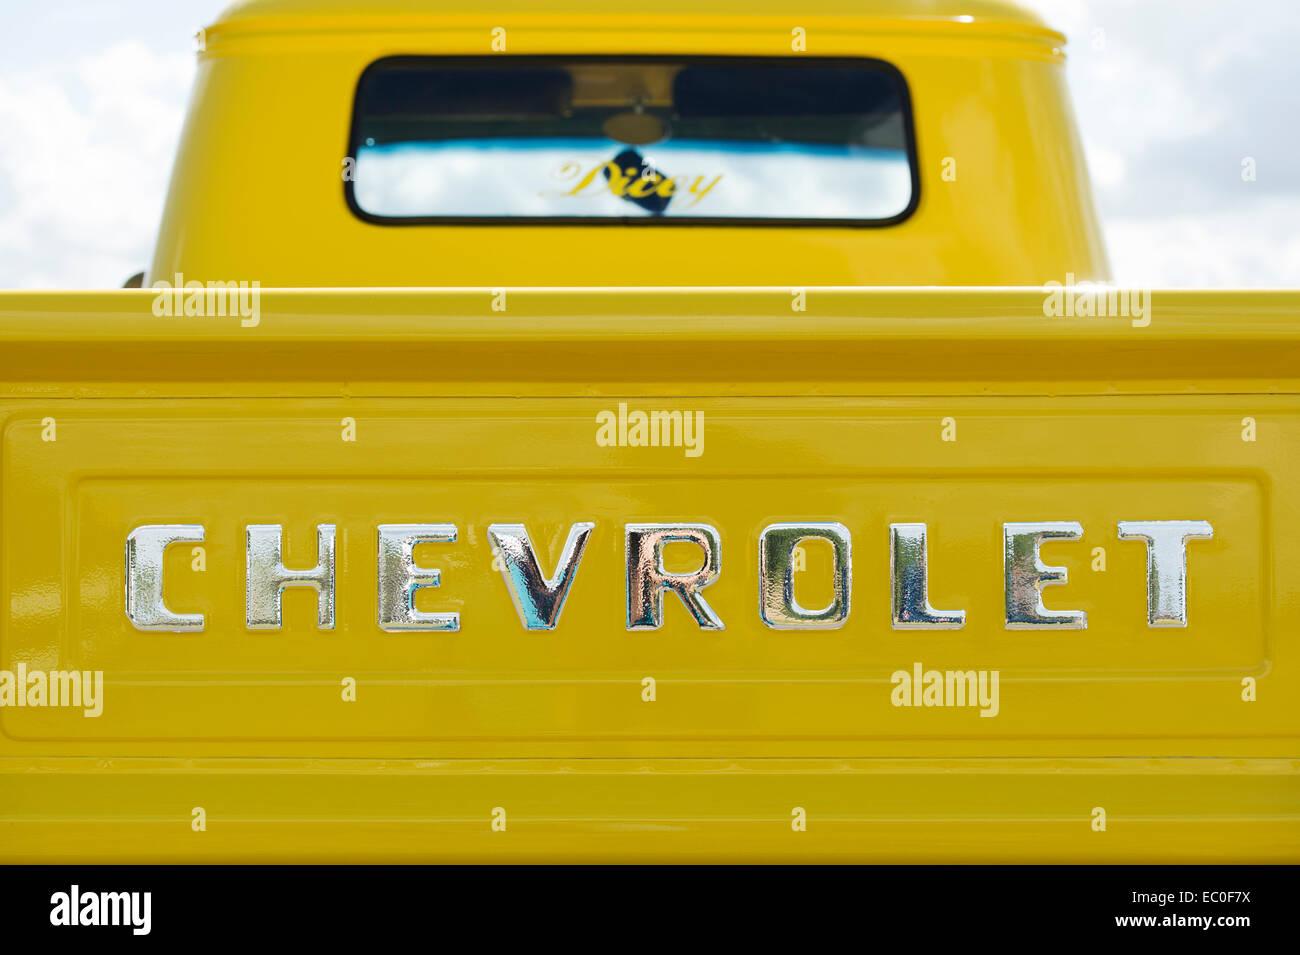 Classic Pickup Trucks Stock Photos Amp Classic Pickup Trucks